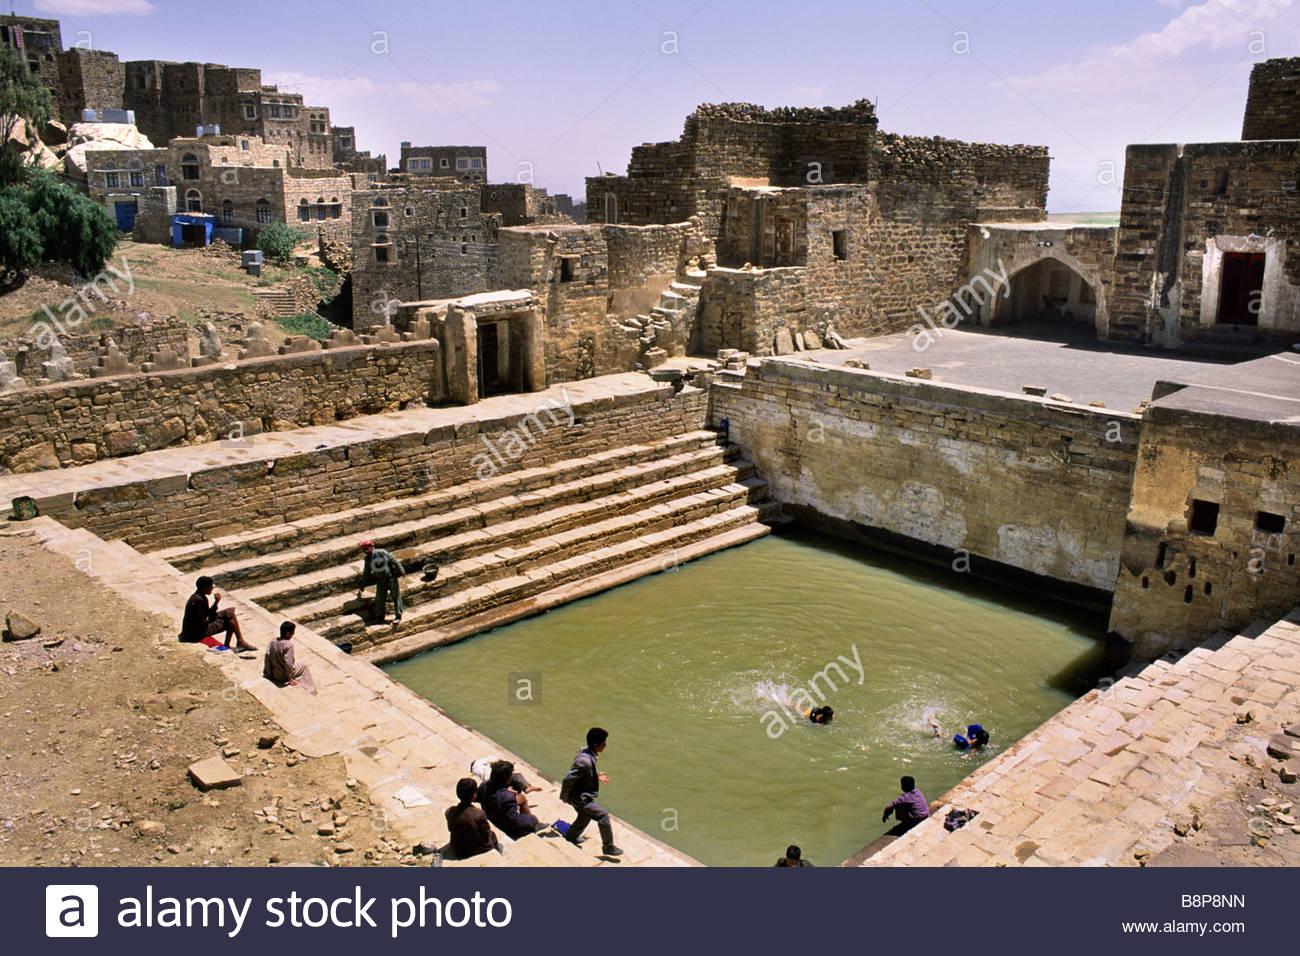 thula, yemen, arabian peninsula - Stock Image